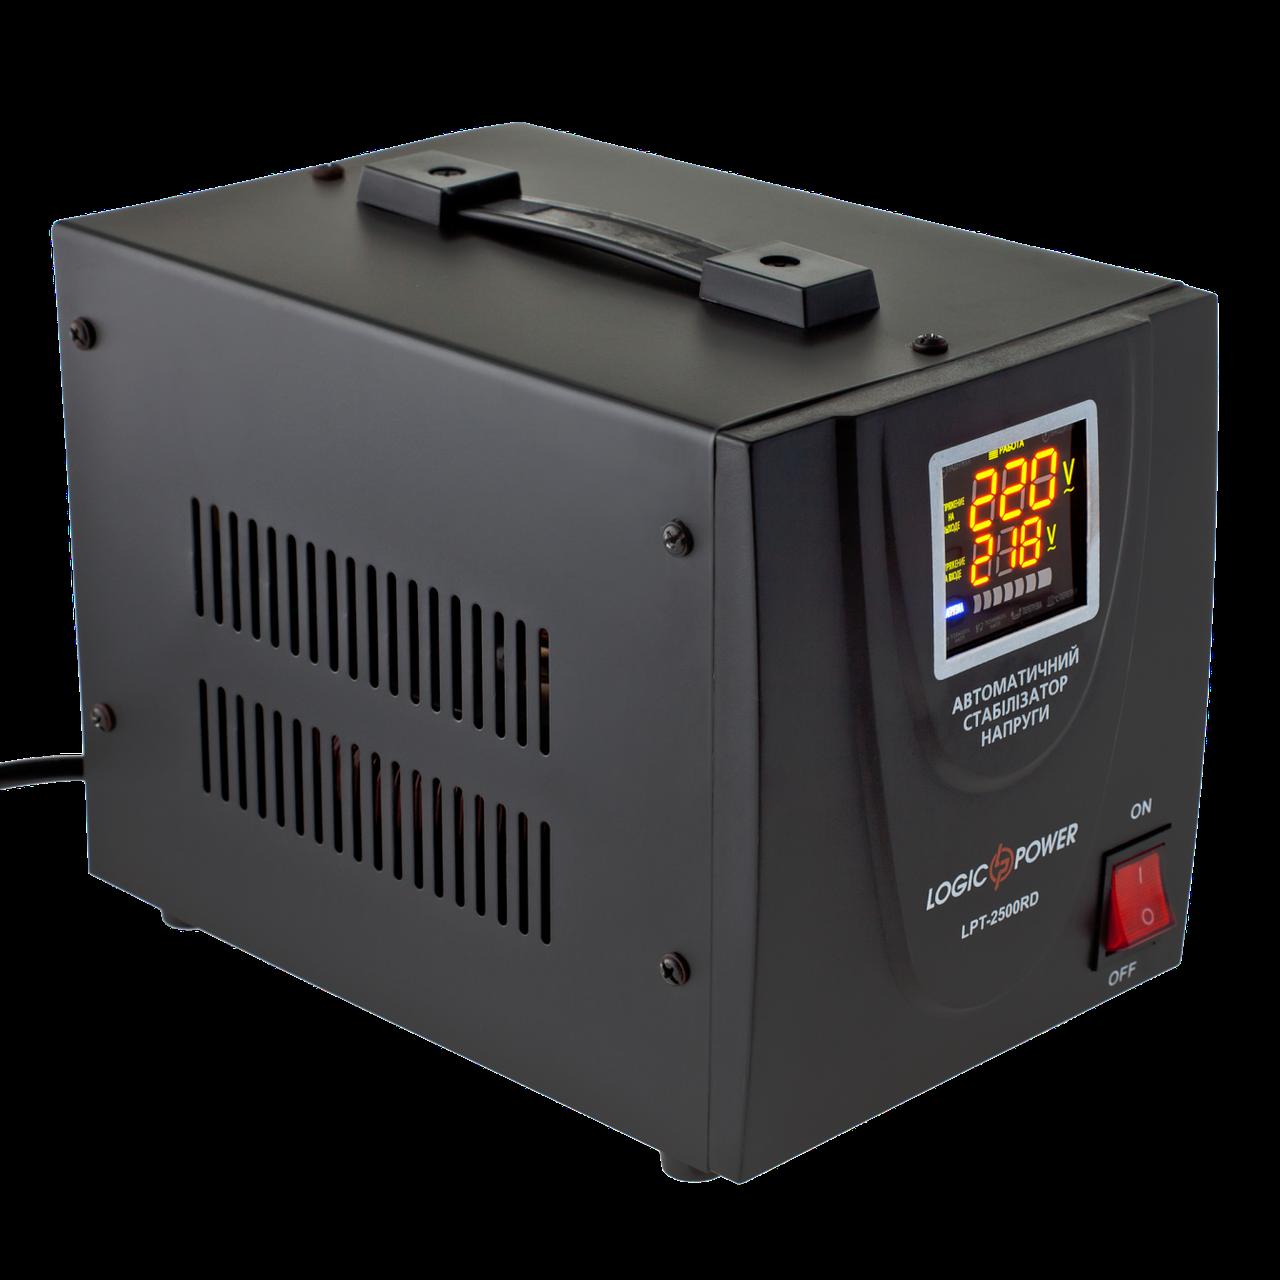 Стабилизатор напряжения LogicPower LPT-2500RD BLACK (1750W)